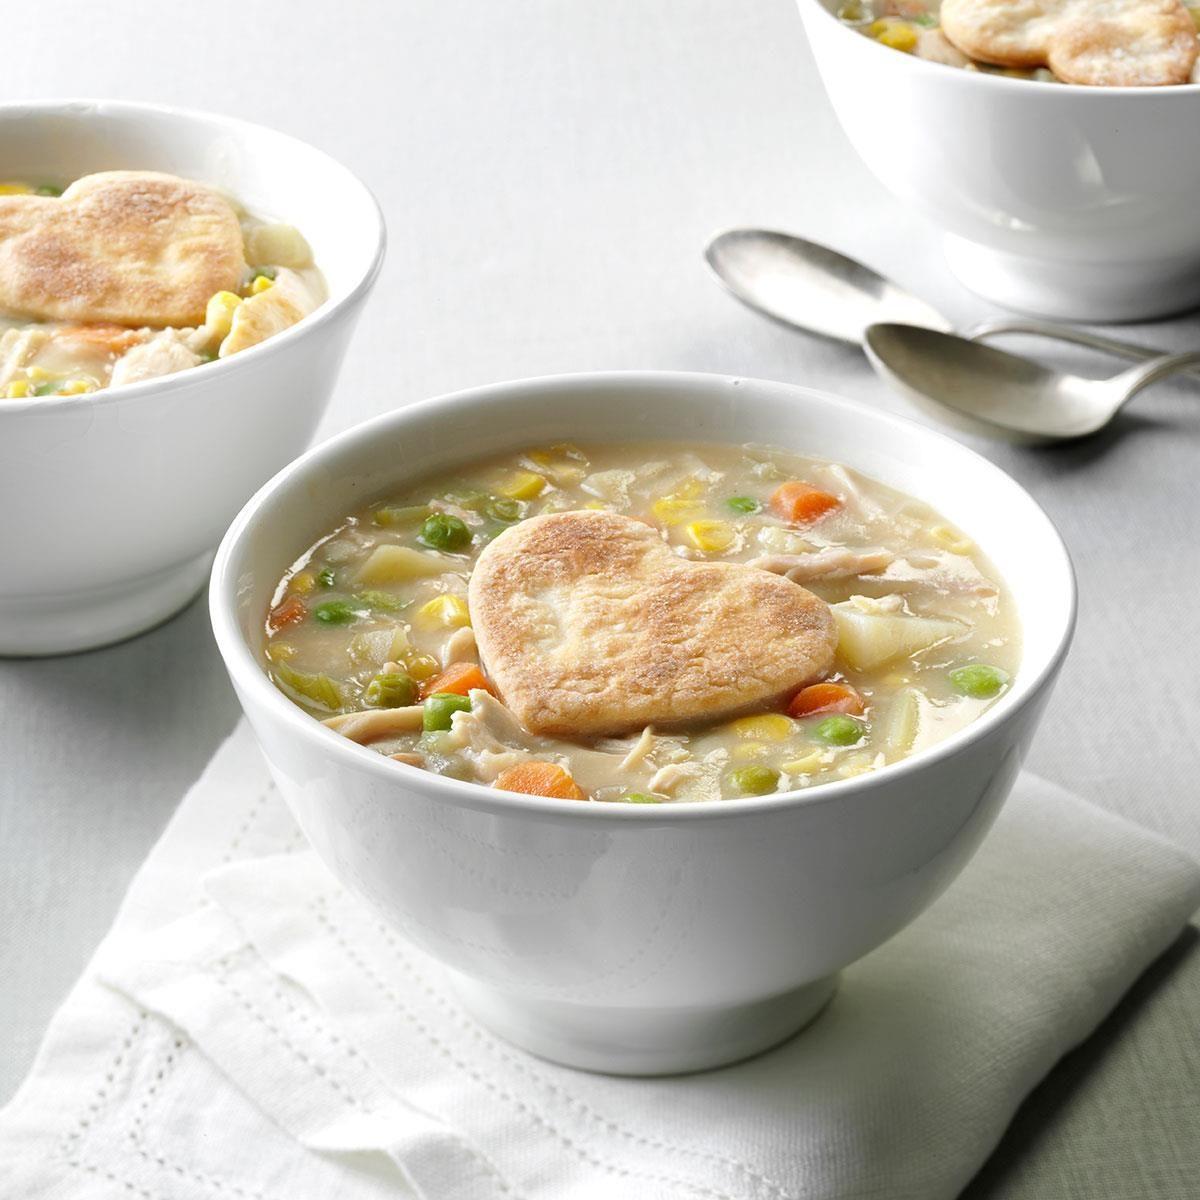 Grandma's Best Soups